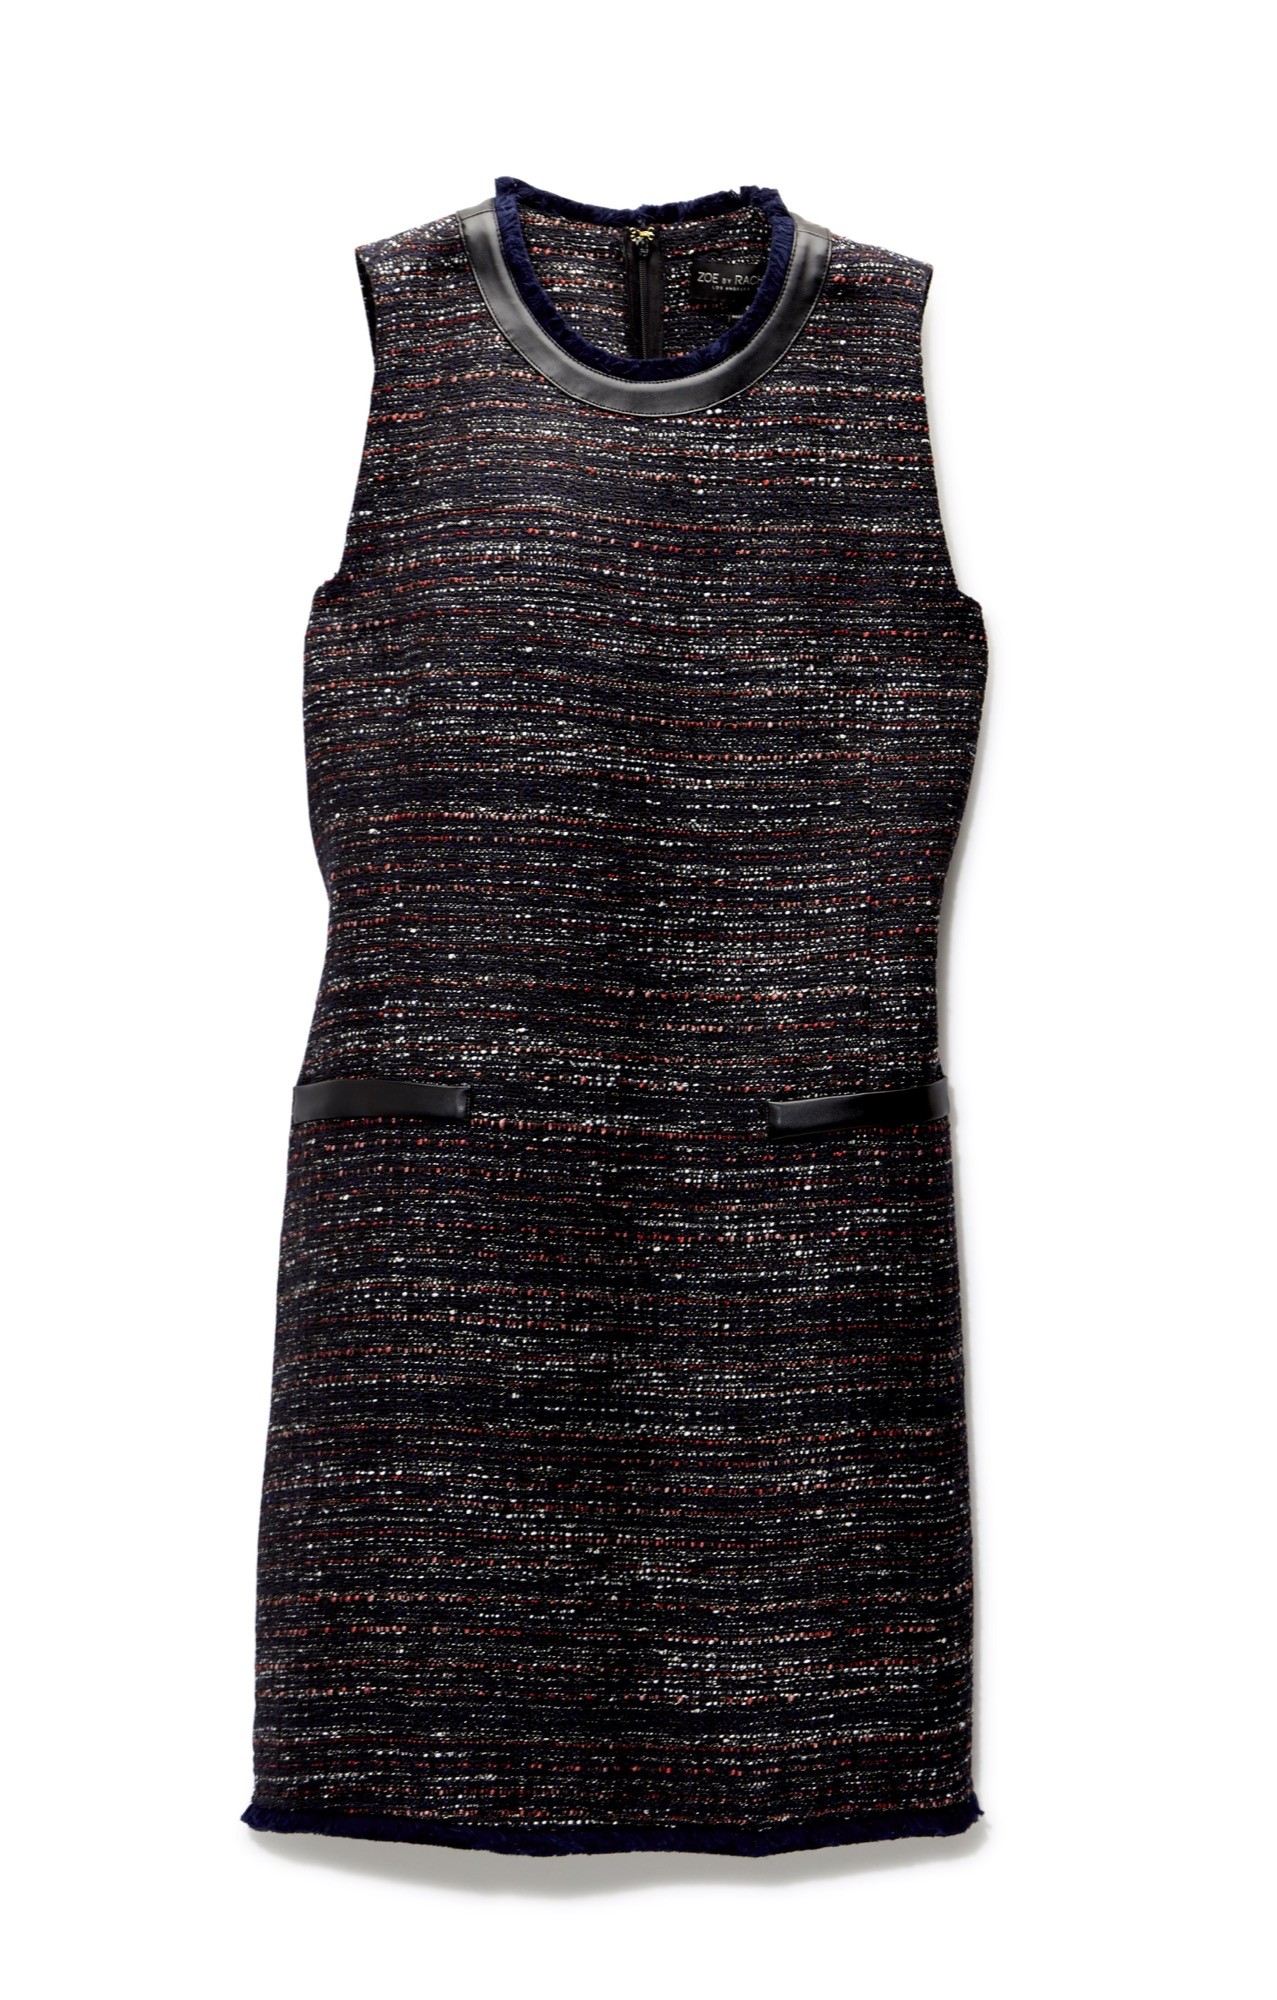 ZOEBYRACHELZOE_CREATED FOR MACYS_ISABELLA DRESS_$149.jpg